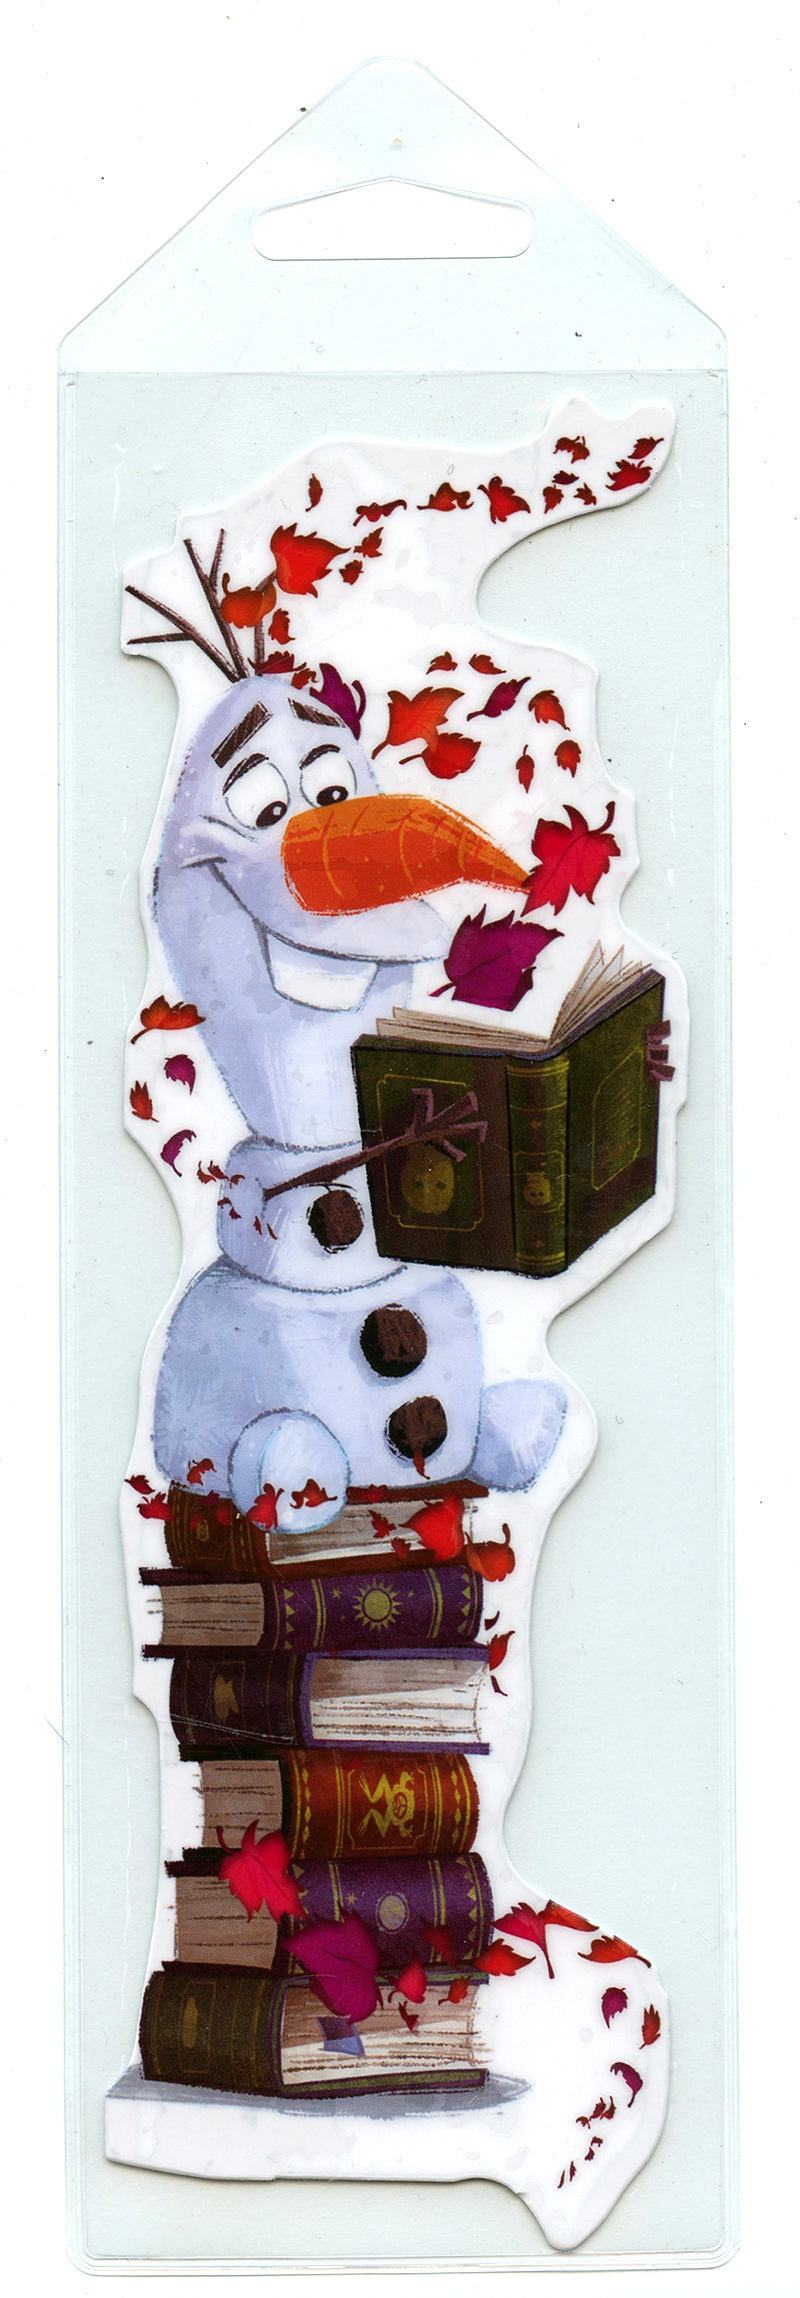 OLAF -  BOOKMARK